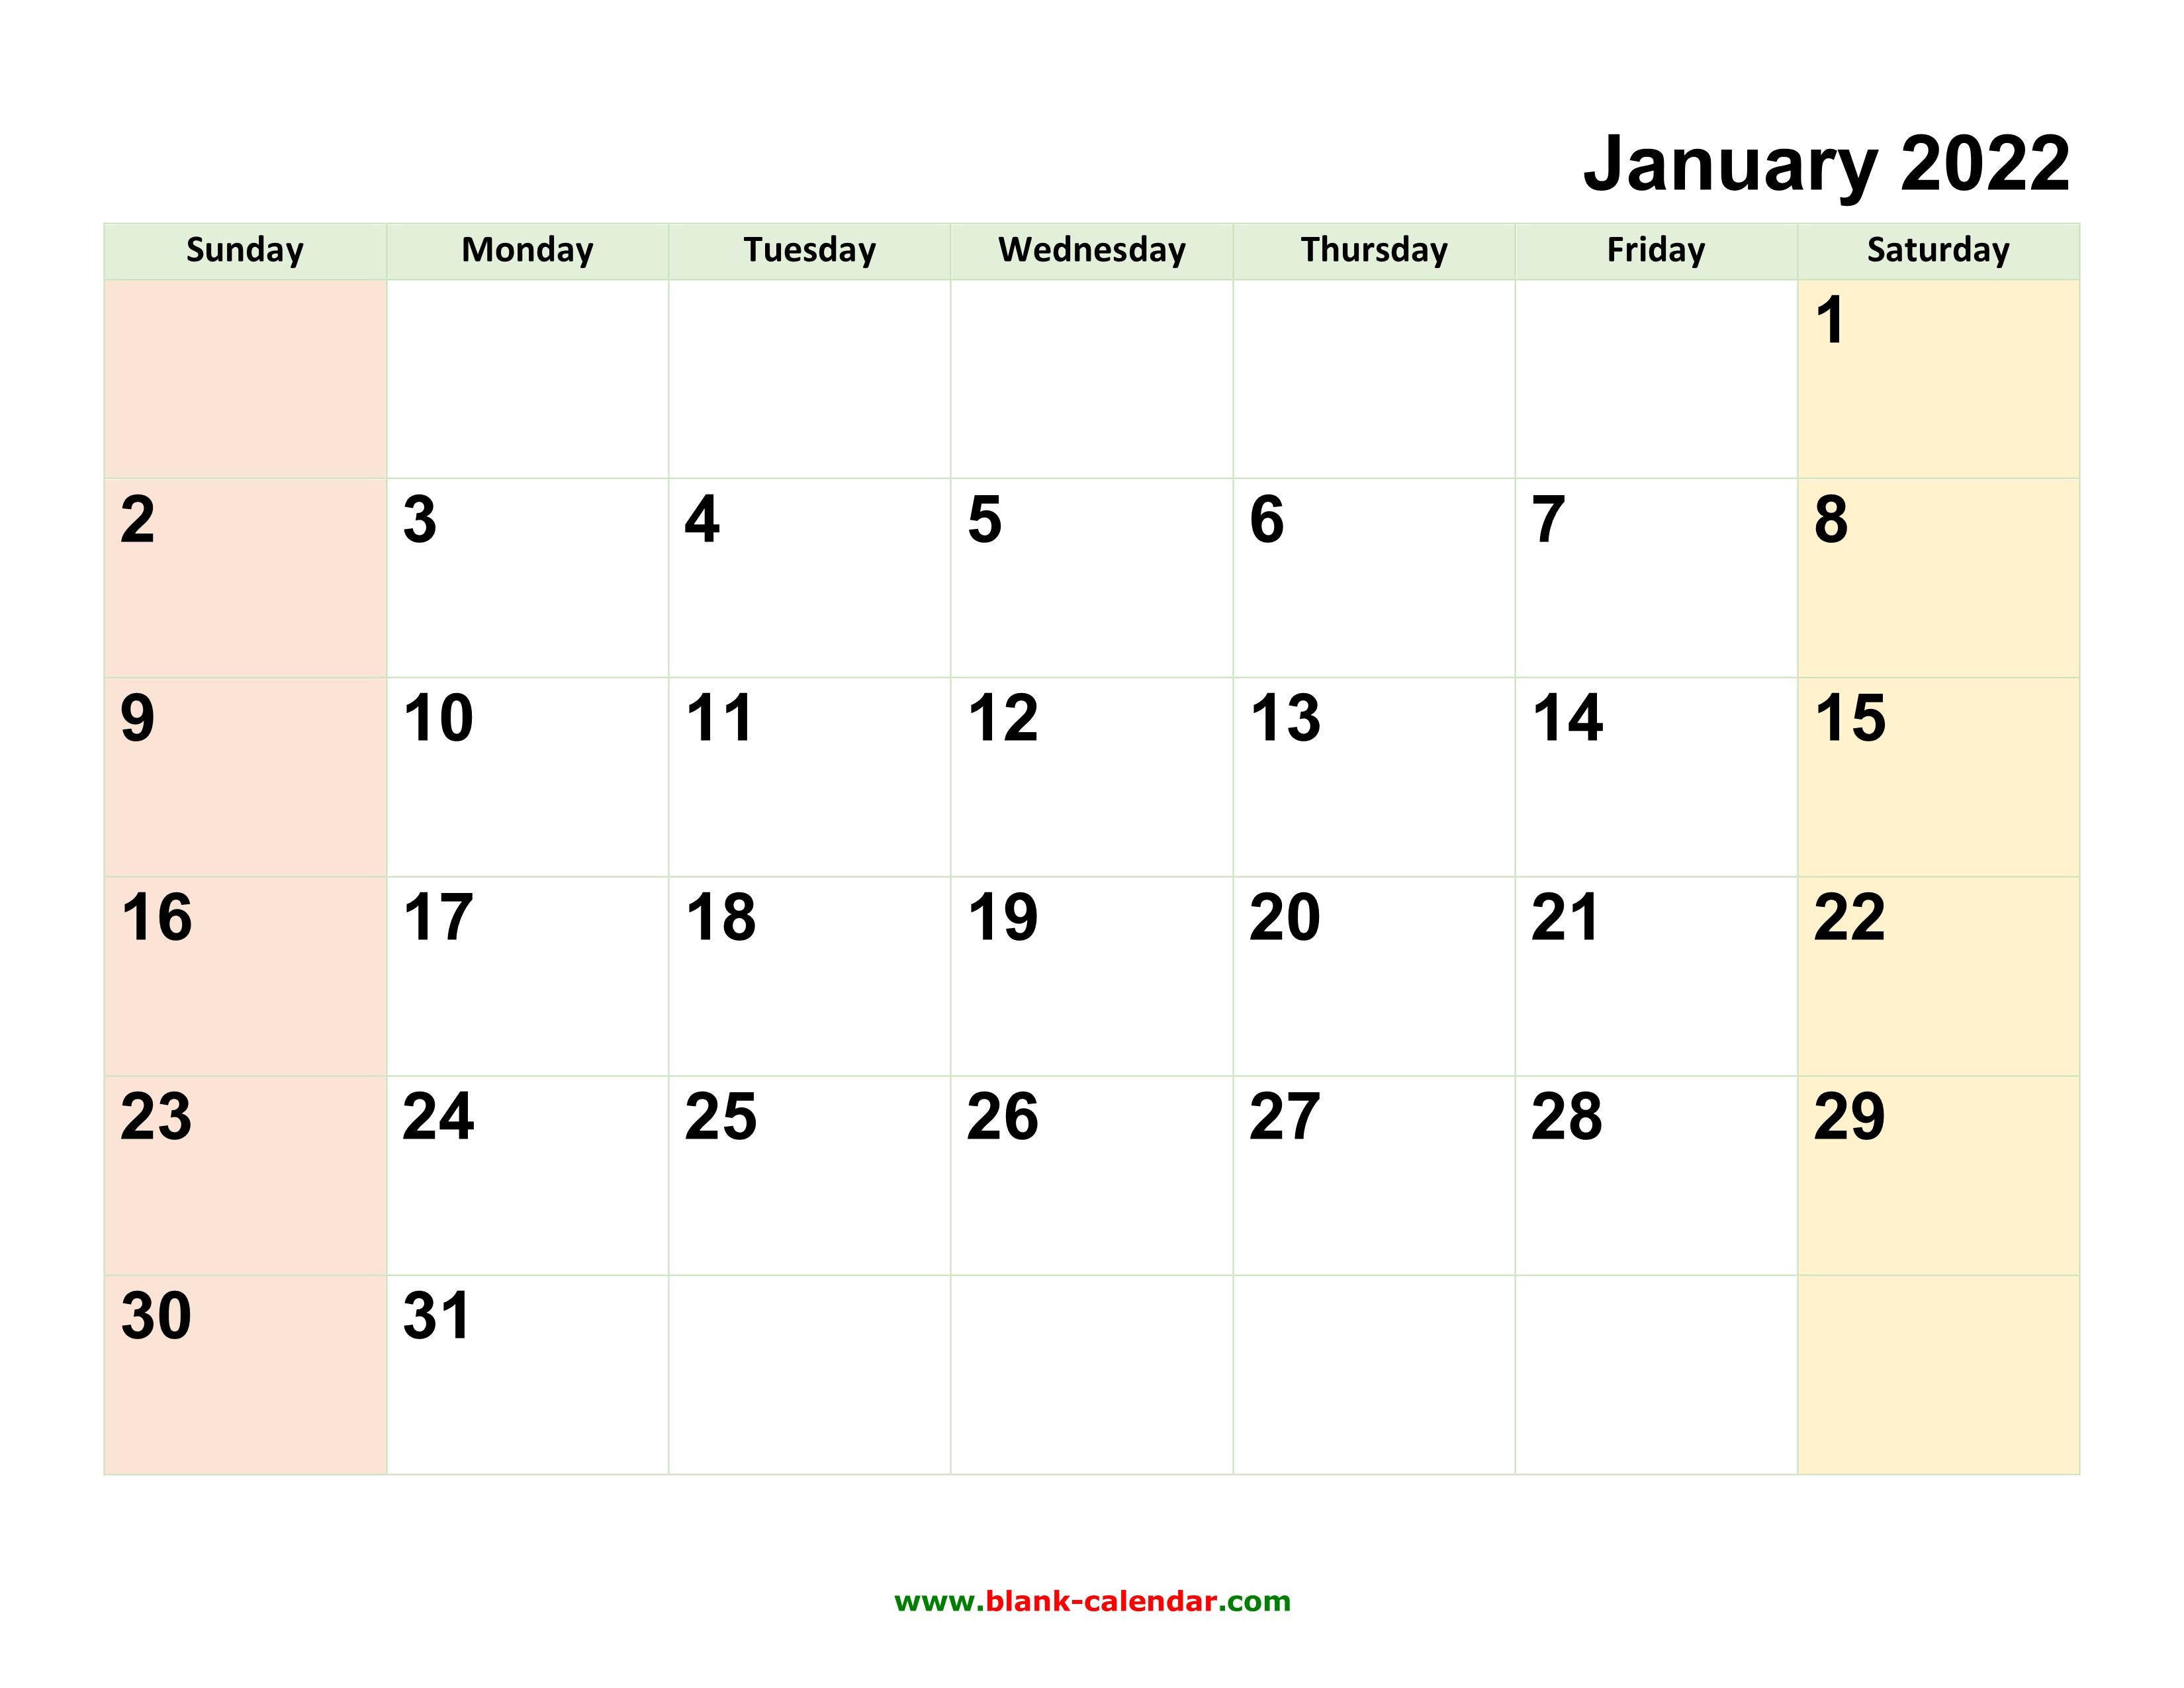 2022 Editable Calendar.Monthly Calendar 2022 Free Download Editable And Printable